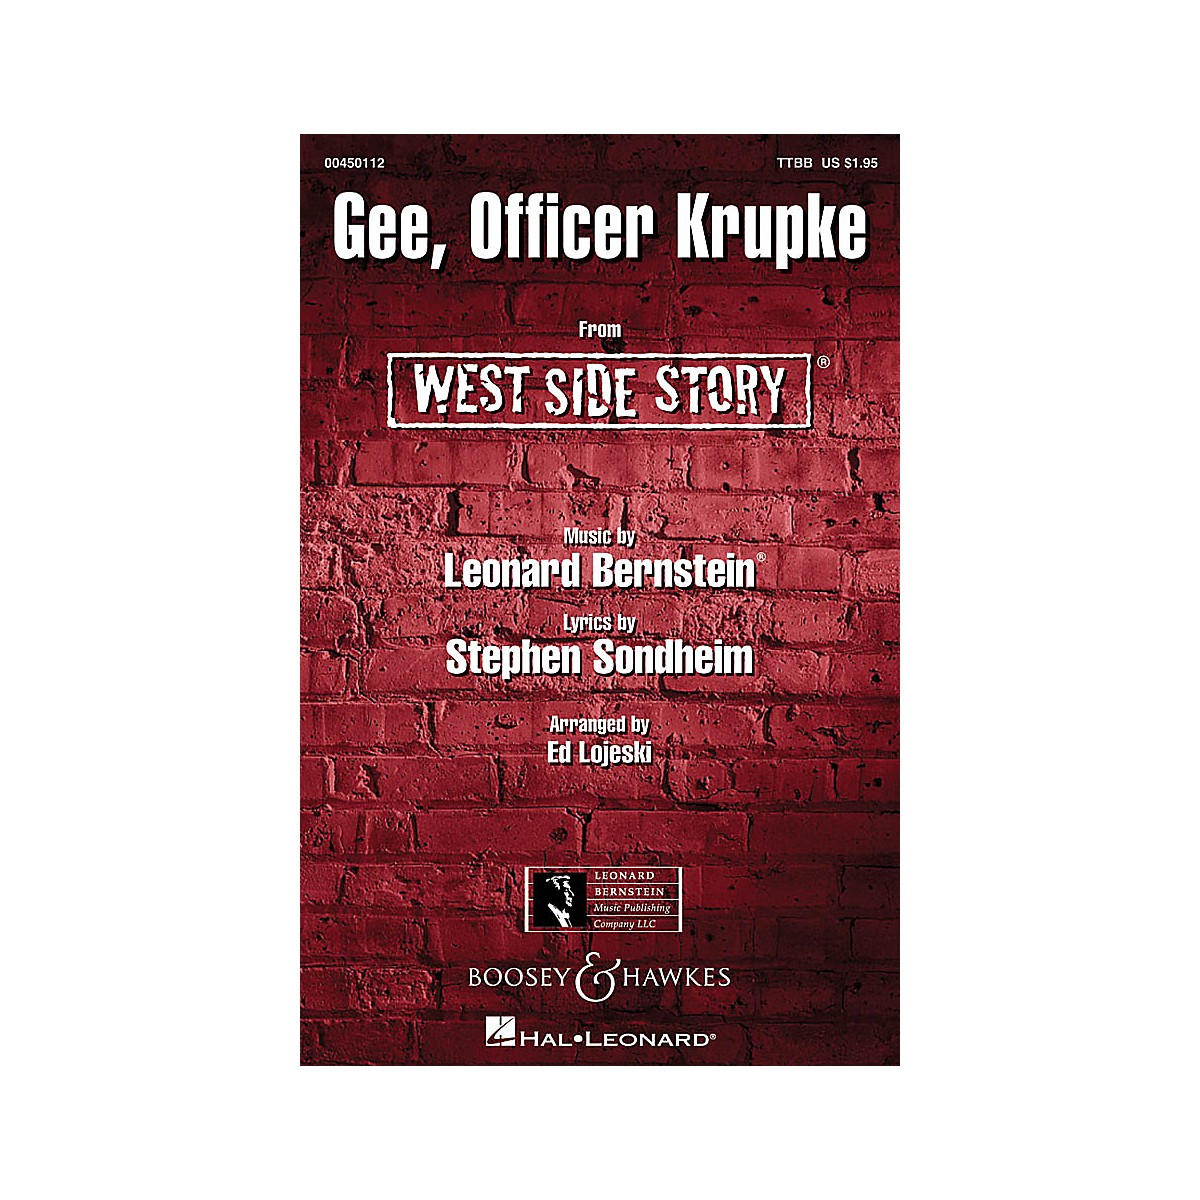 Hal Leonard Gee, Officer Krupke (from West Side Story) TTBB Arranged by Ed Lojeski